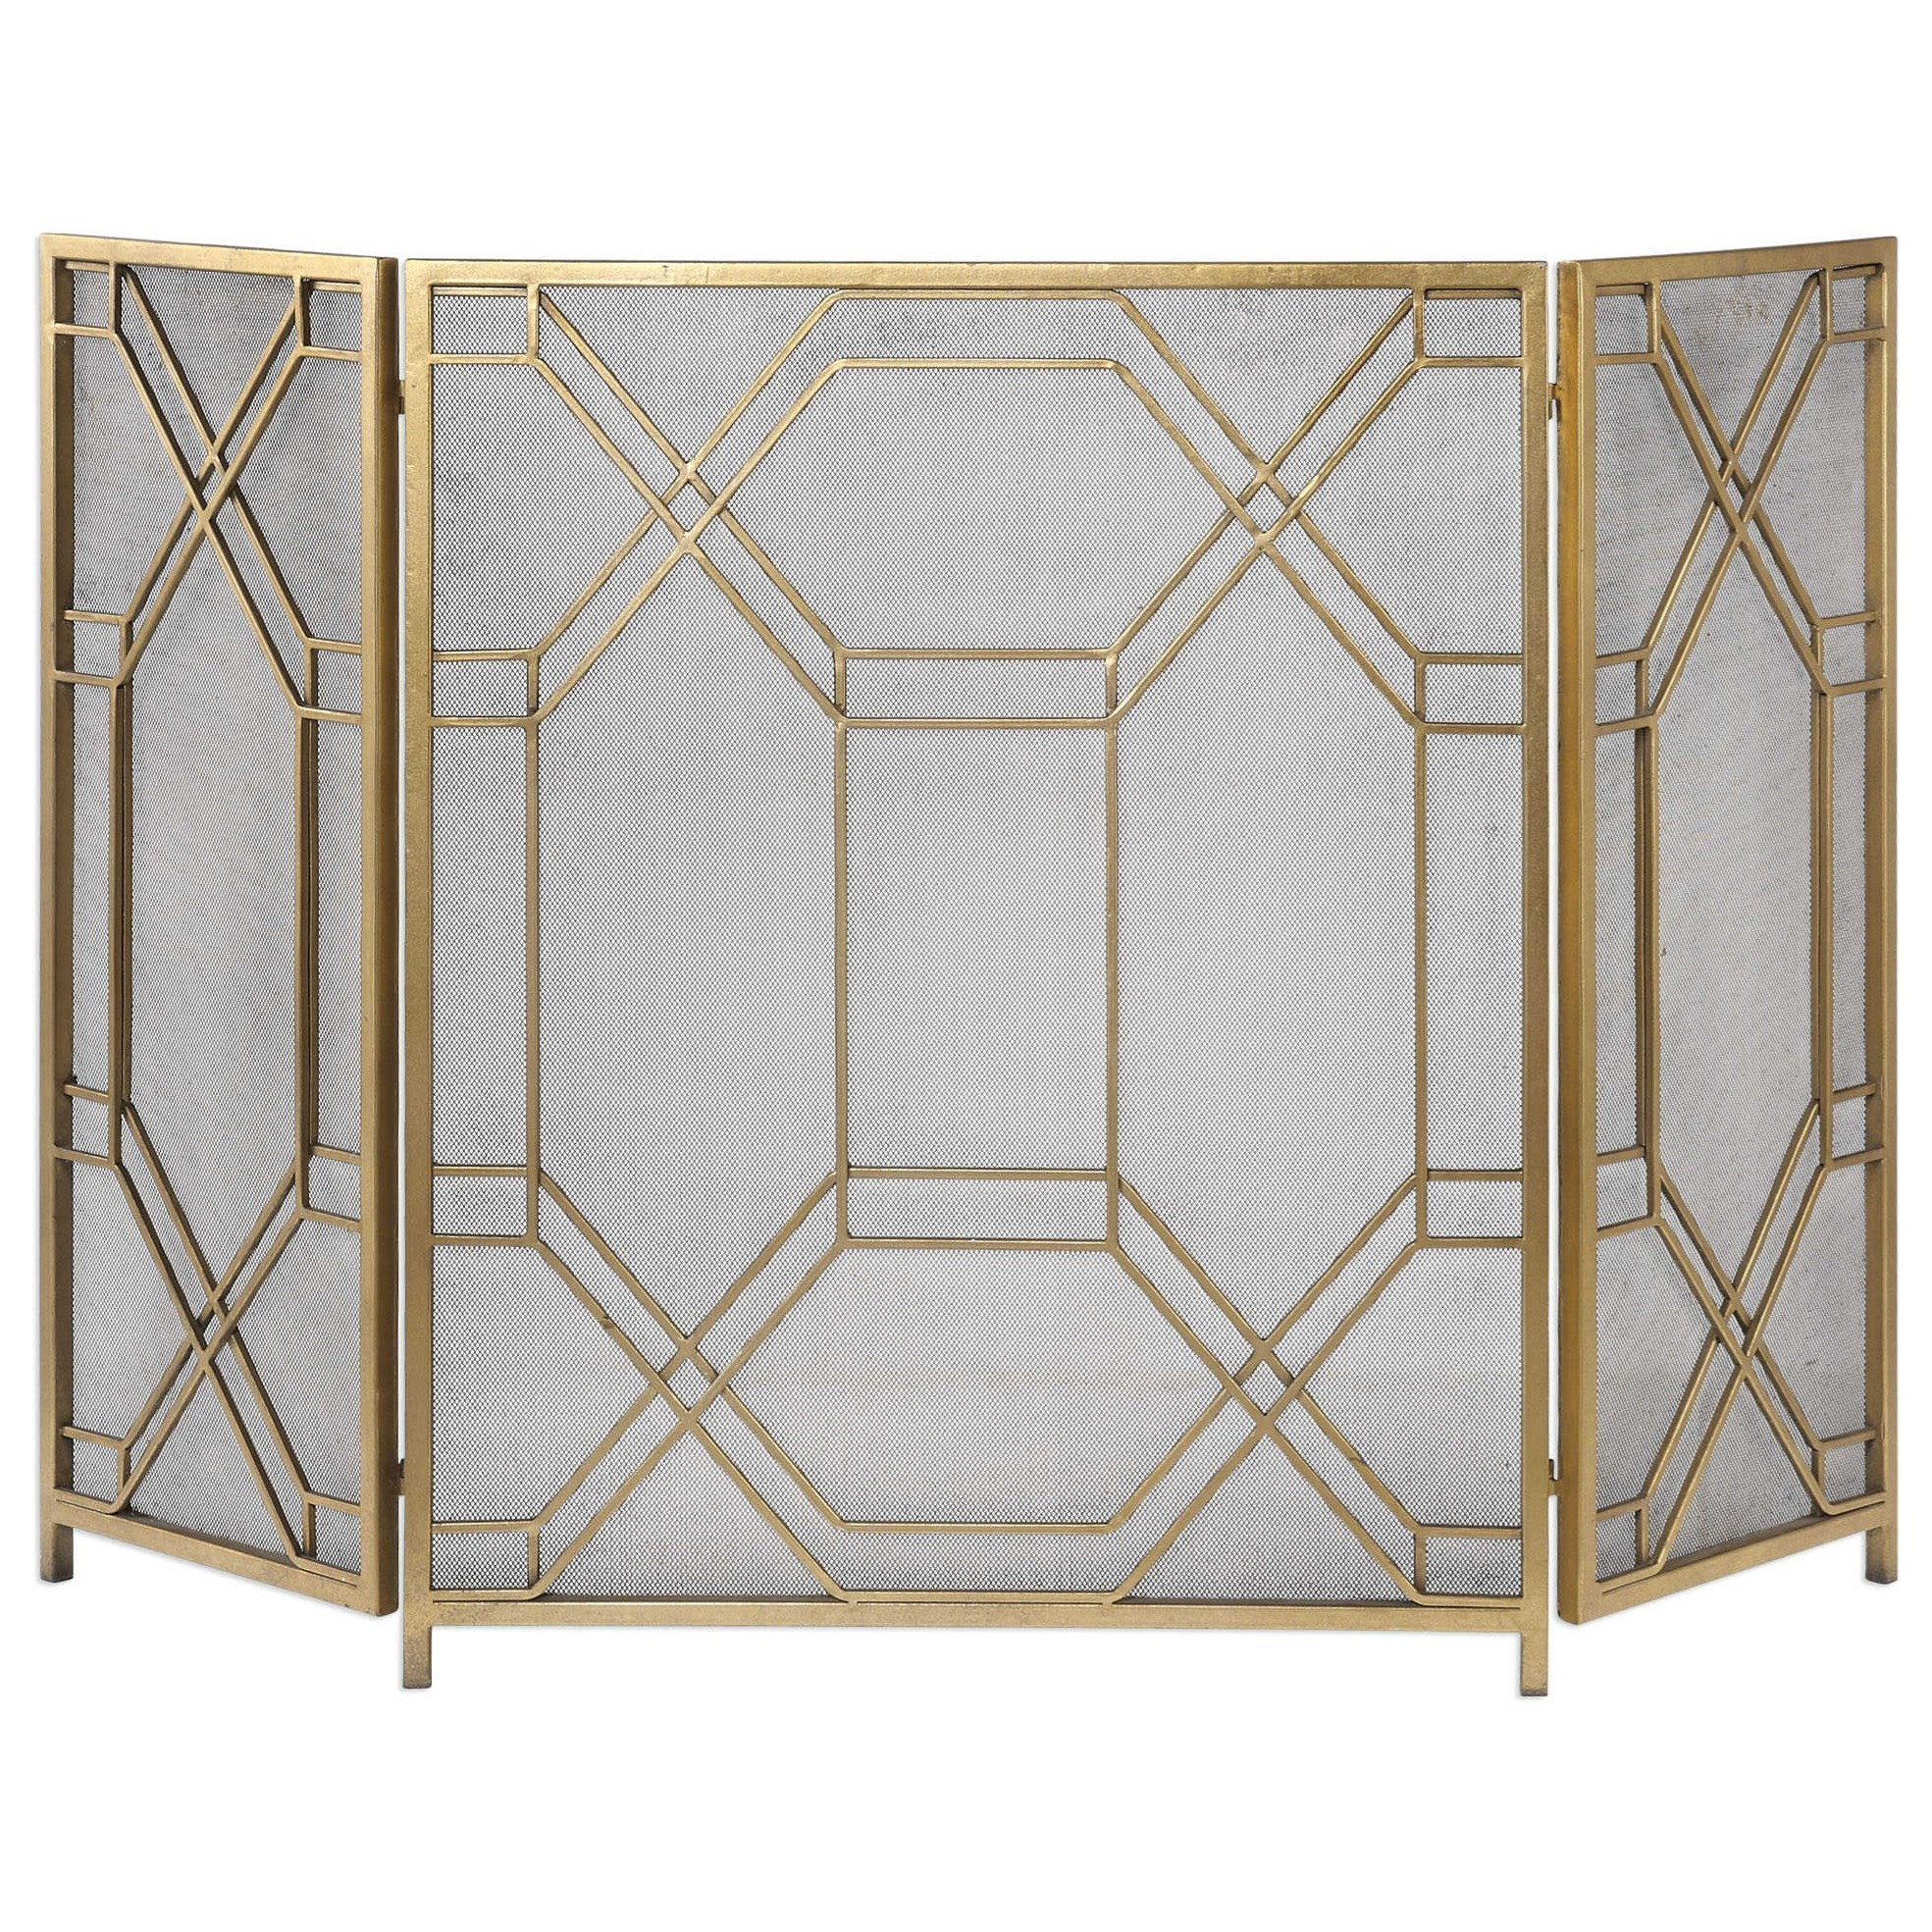 Accessories Rosen Gold Fireplace Screen by Uttermost at Mueller Furniture